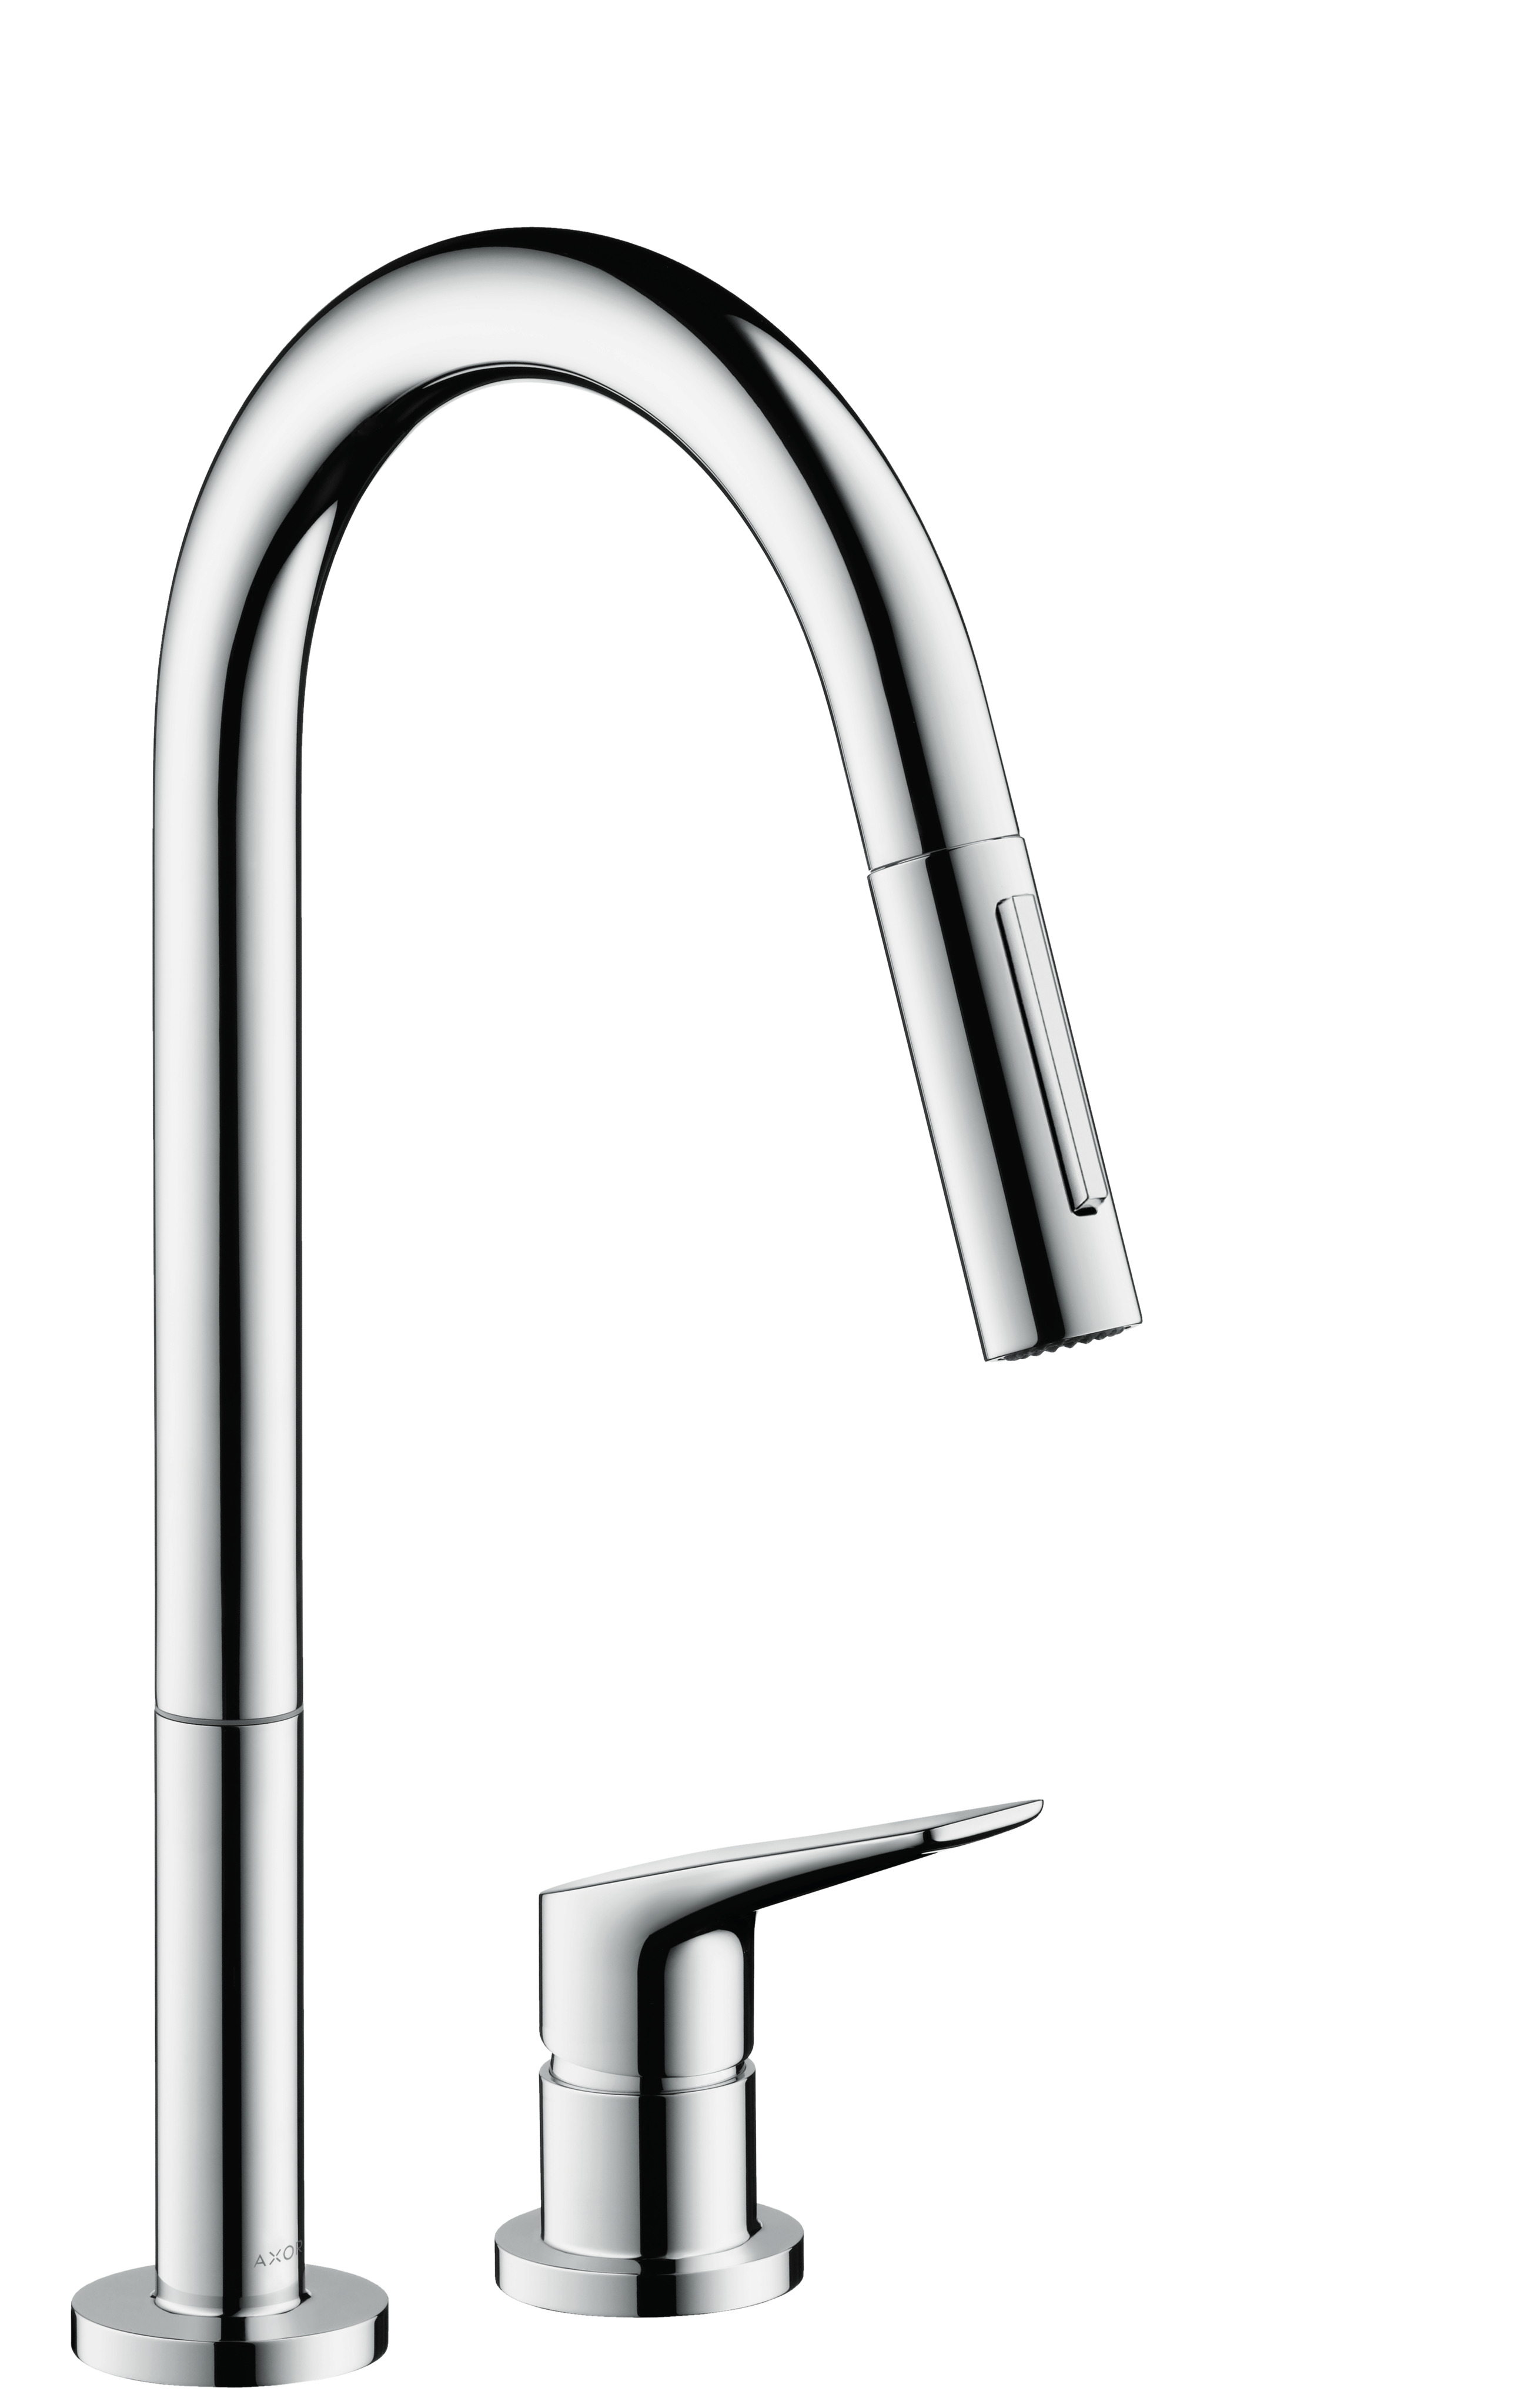 3 hole kitchen faucets cabinets fayetteville nc 雅生雅生奇特里奥m 雅生奇特里奥m双孔单把手厨房龙头带拉出式喷头 34822000